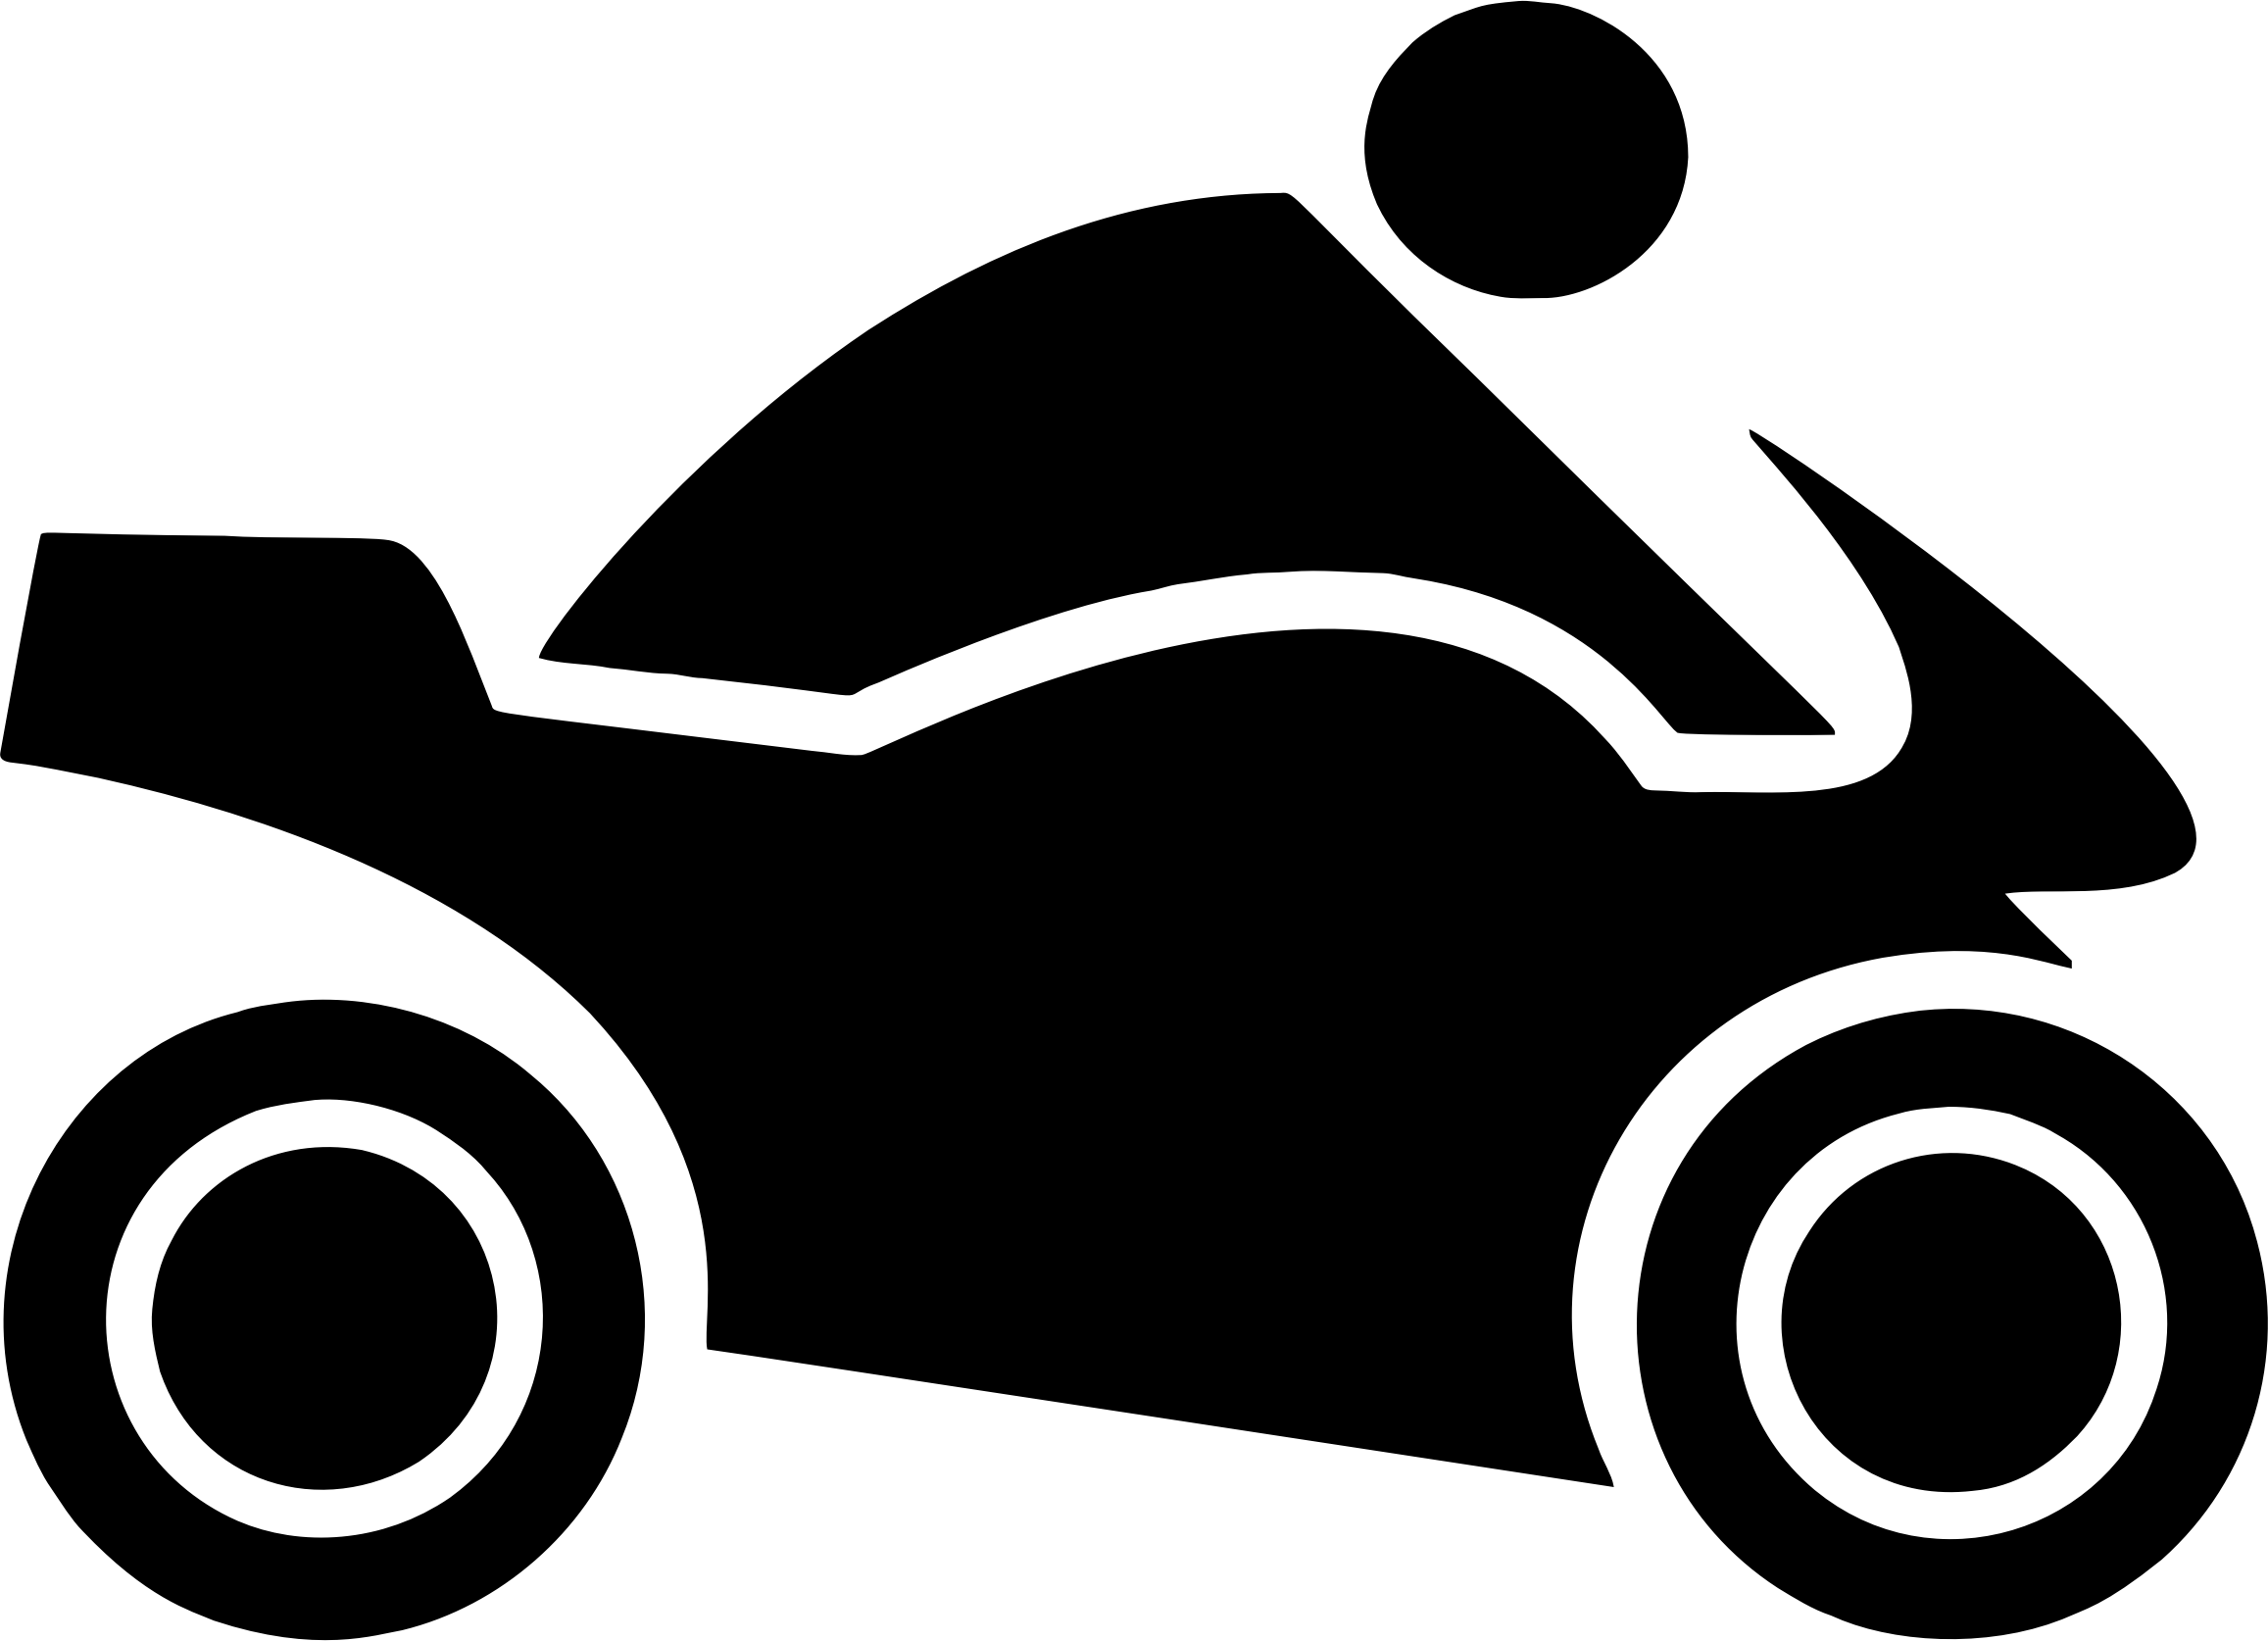 Carlisle tyres next day. Motorcycle clipart logo